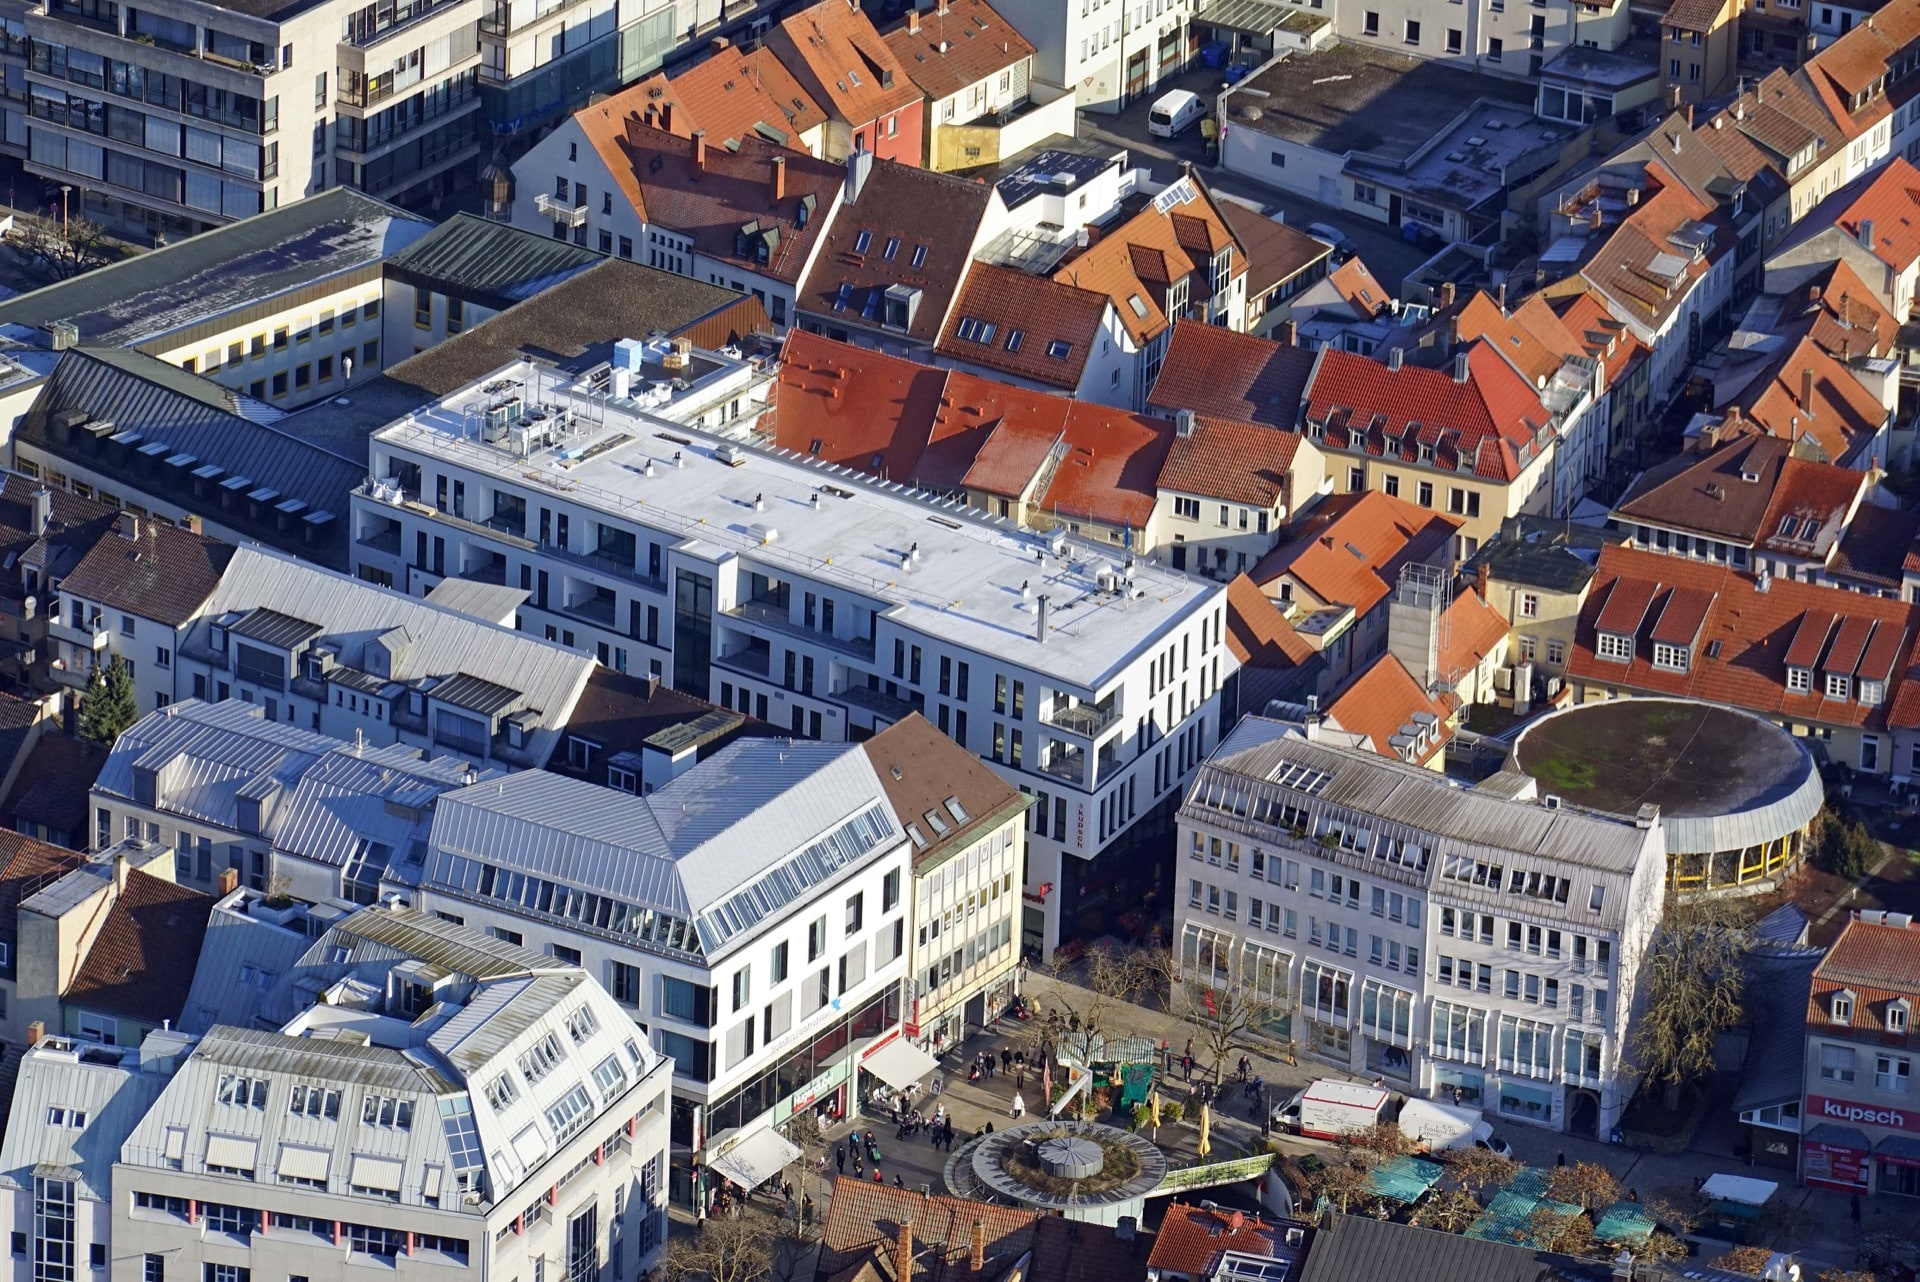 City-Karree 'Am alten Postplatz' in Schweinfurt